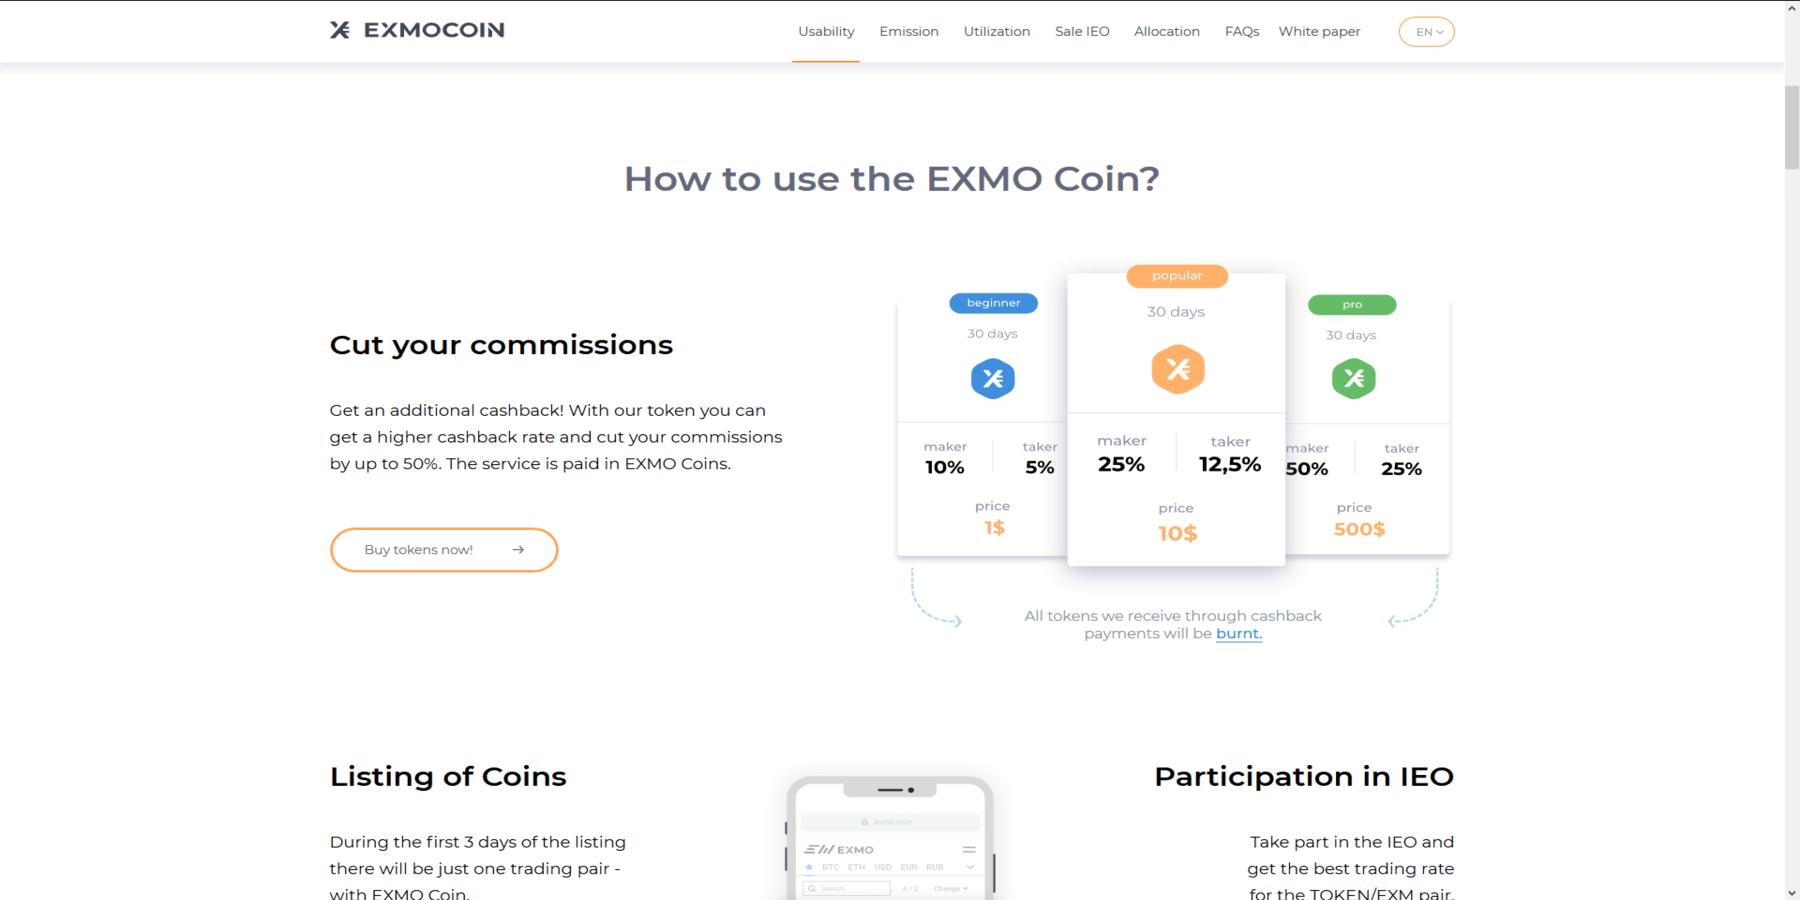 Exmo coin IEO